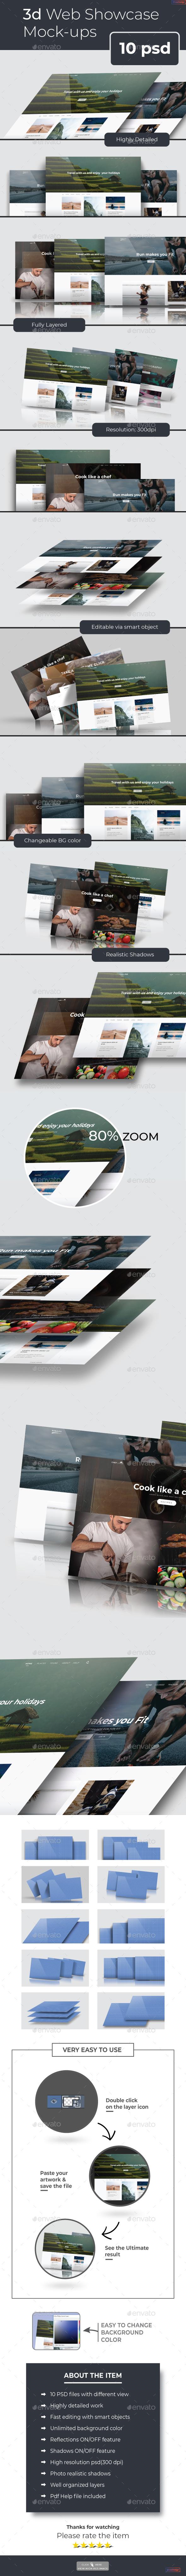 3d Web Showcase Mockups - Product Mock-Ups Graphics